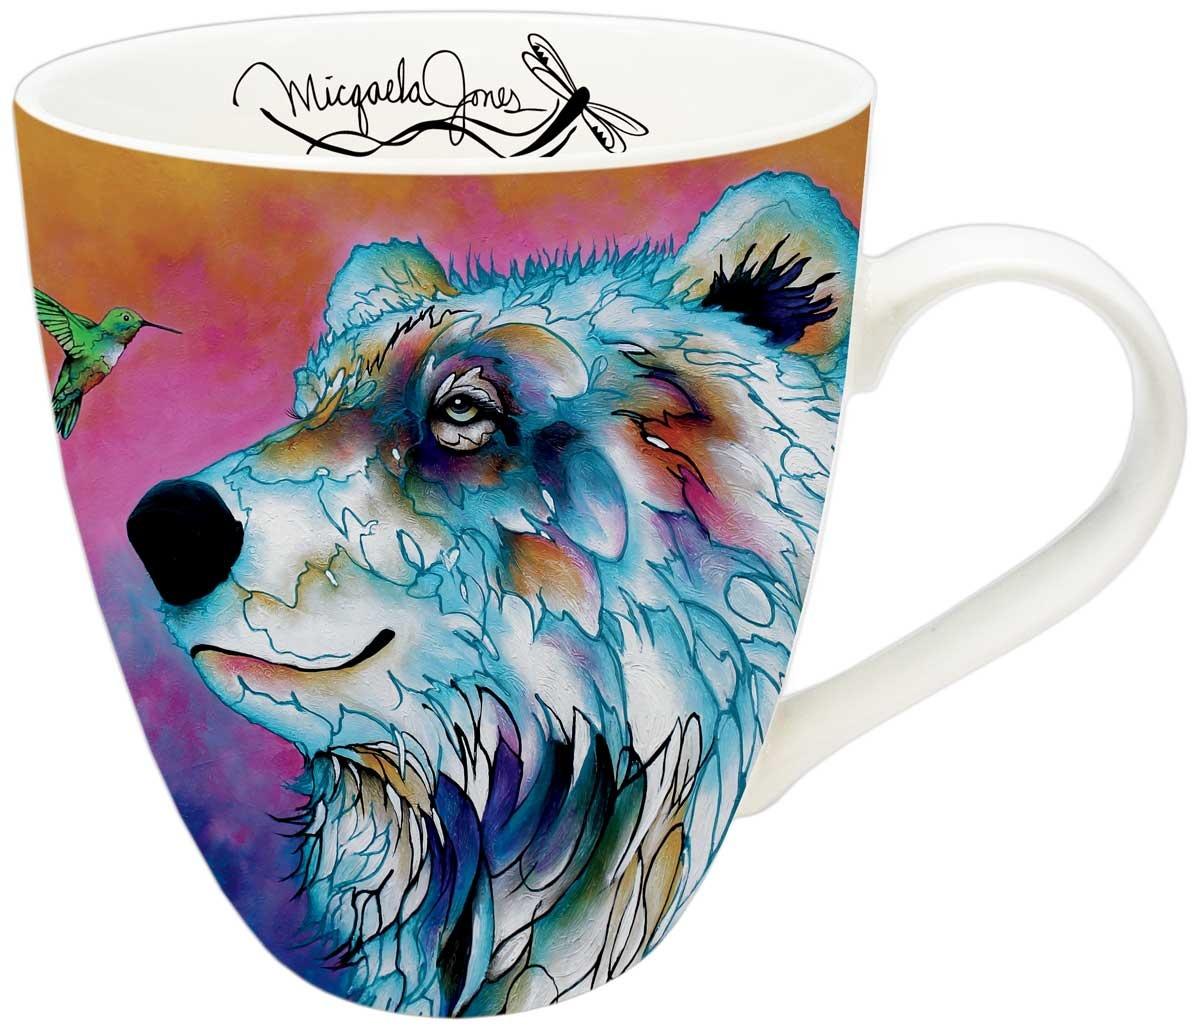 Sunrise Tales -Art Mug by Micqaela Jones-1